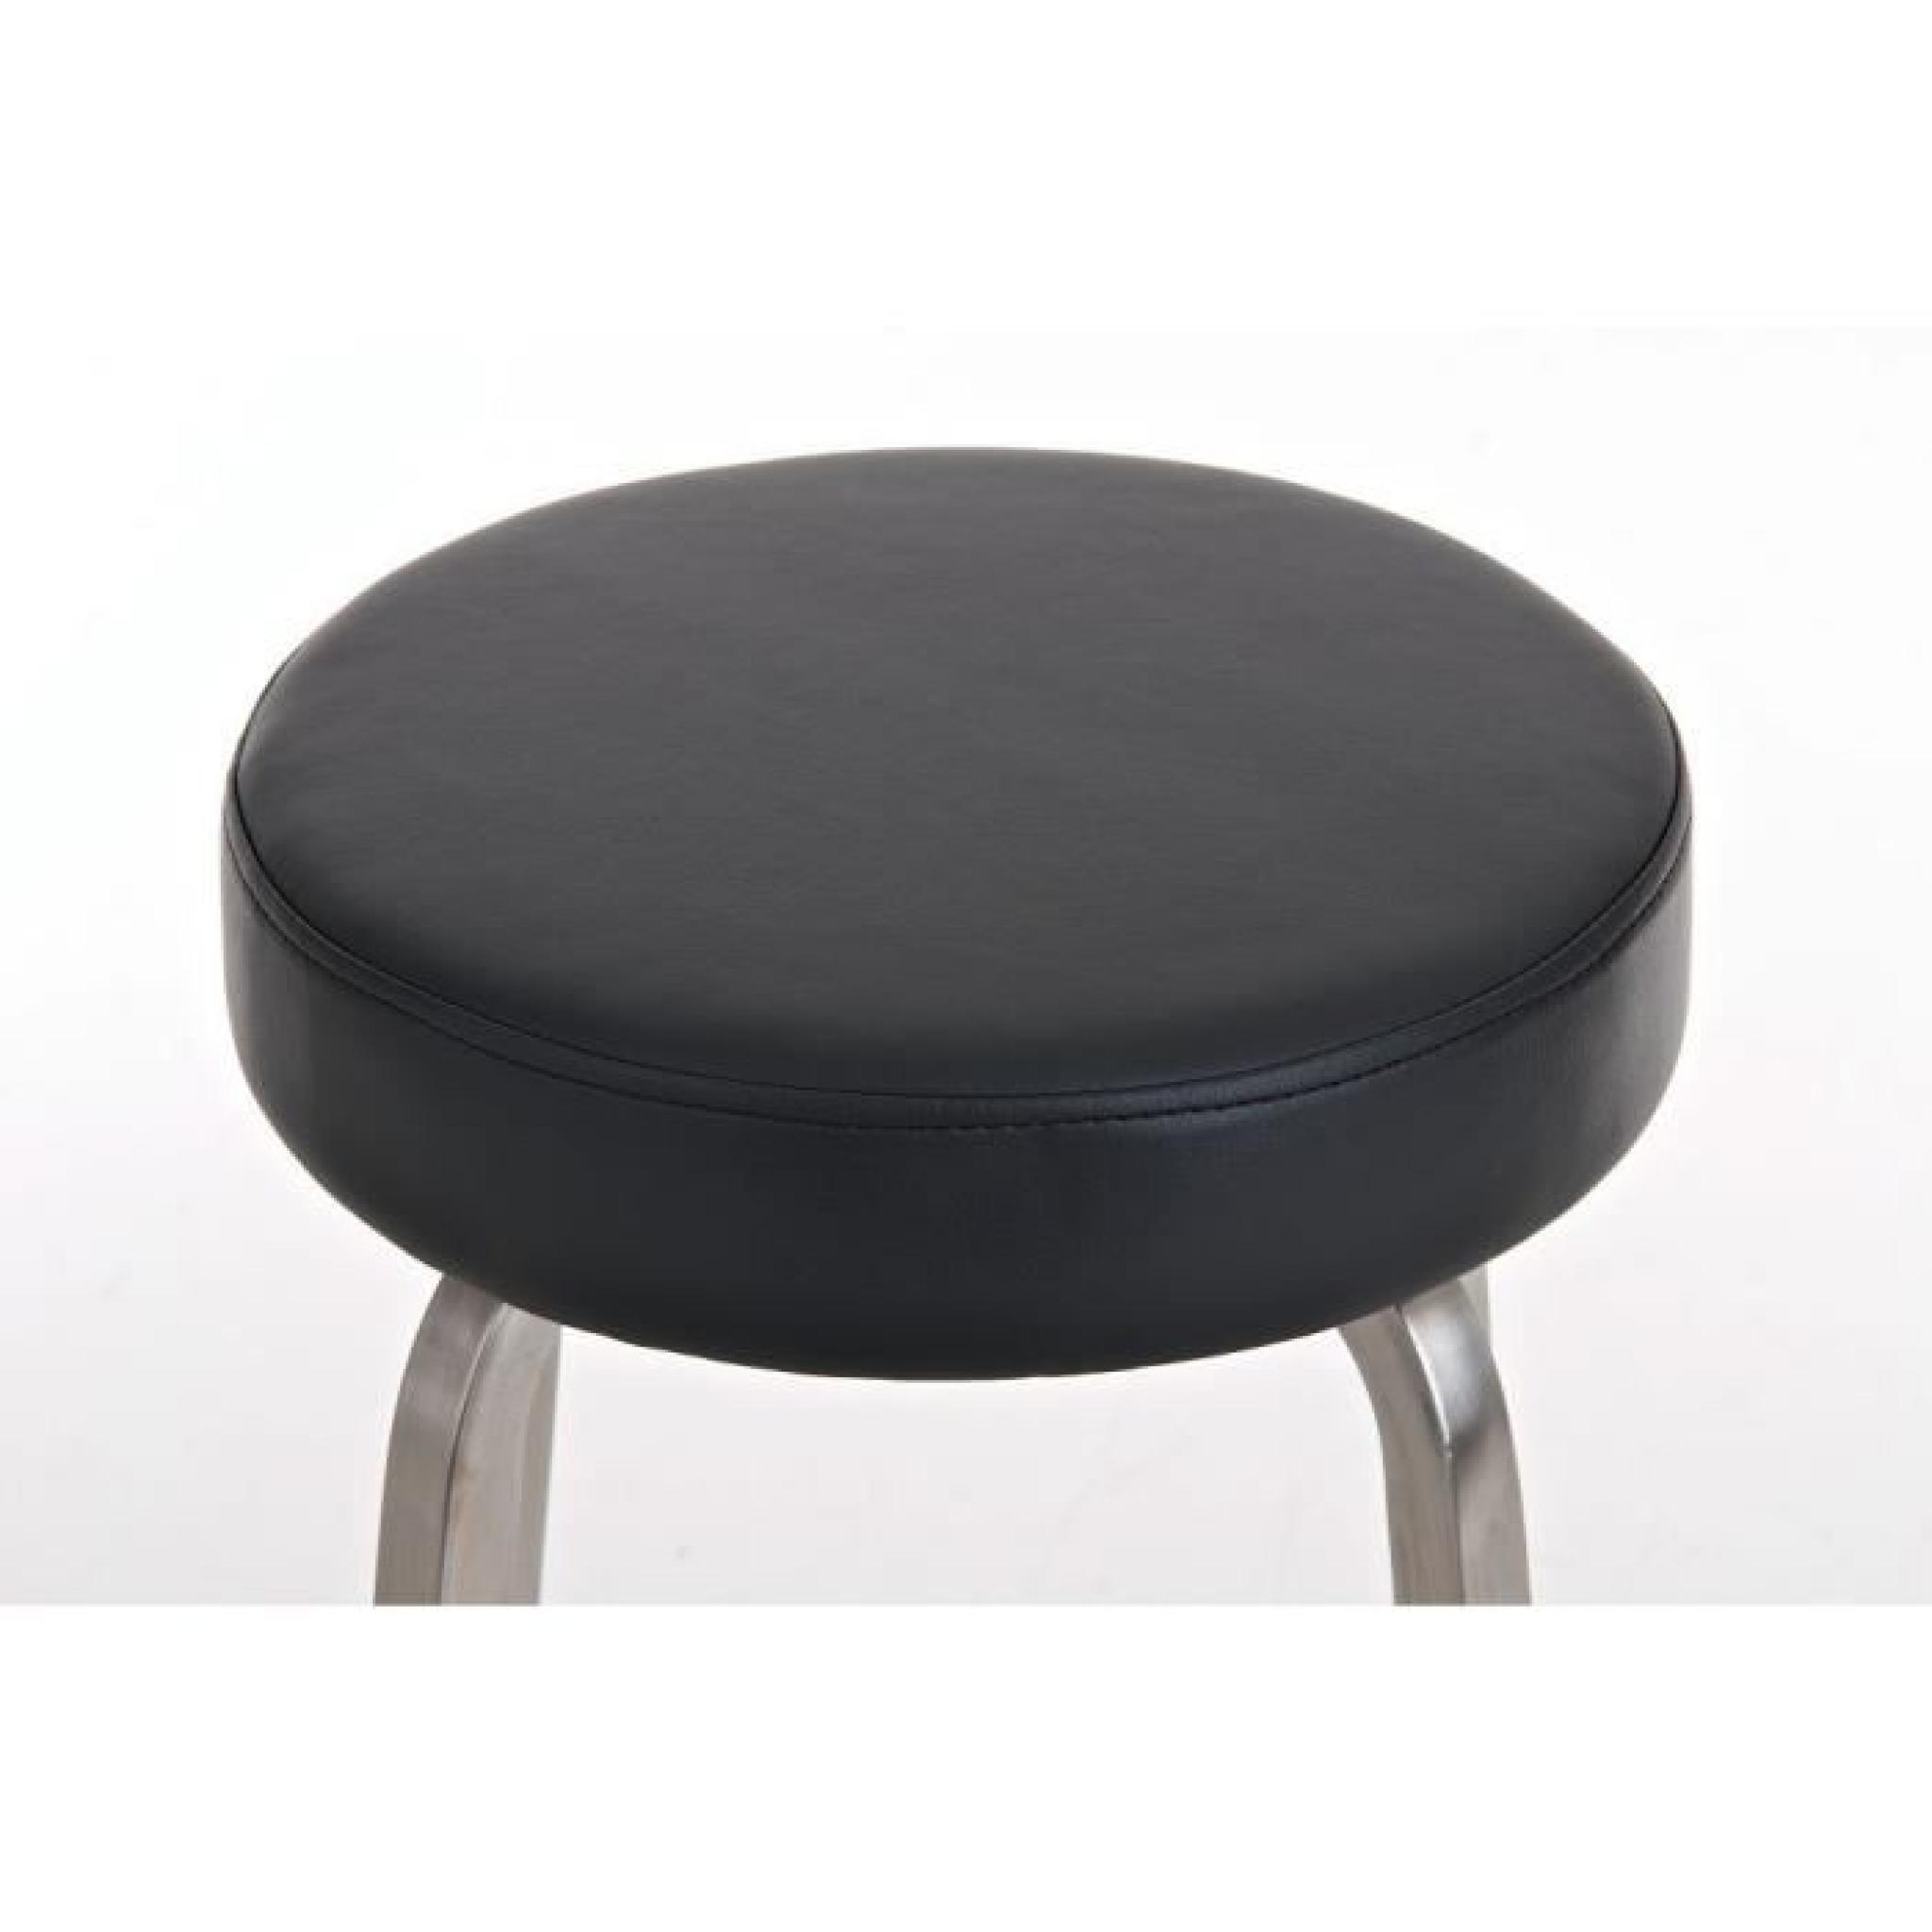 Clp rond en acier inoxydable tabouret kamari hauteur d for Table cuisine hauteur 85 cm